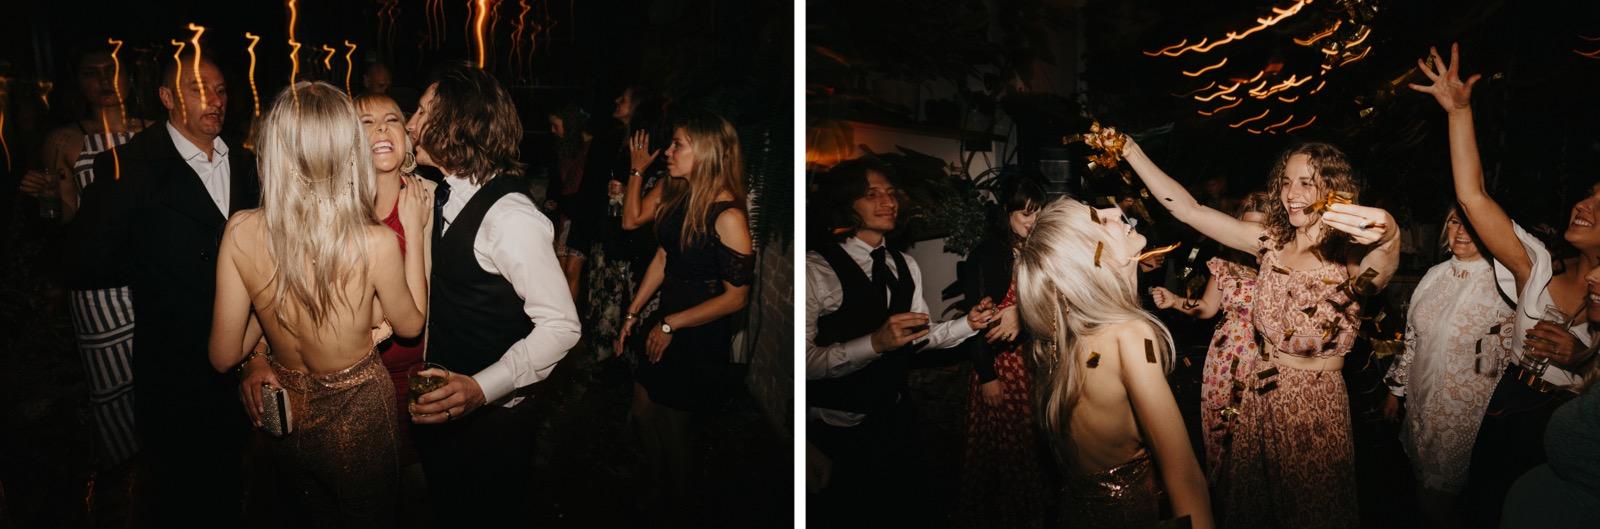 documentary-wedding-photography 00219